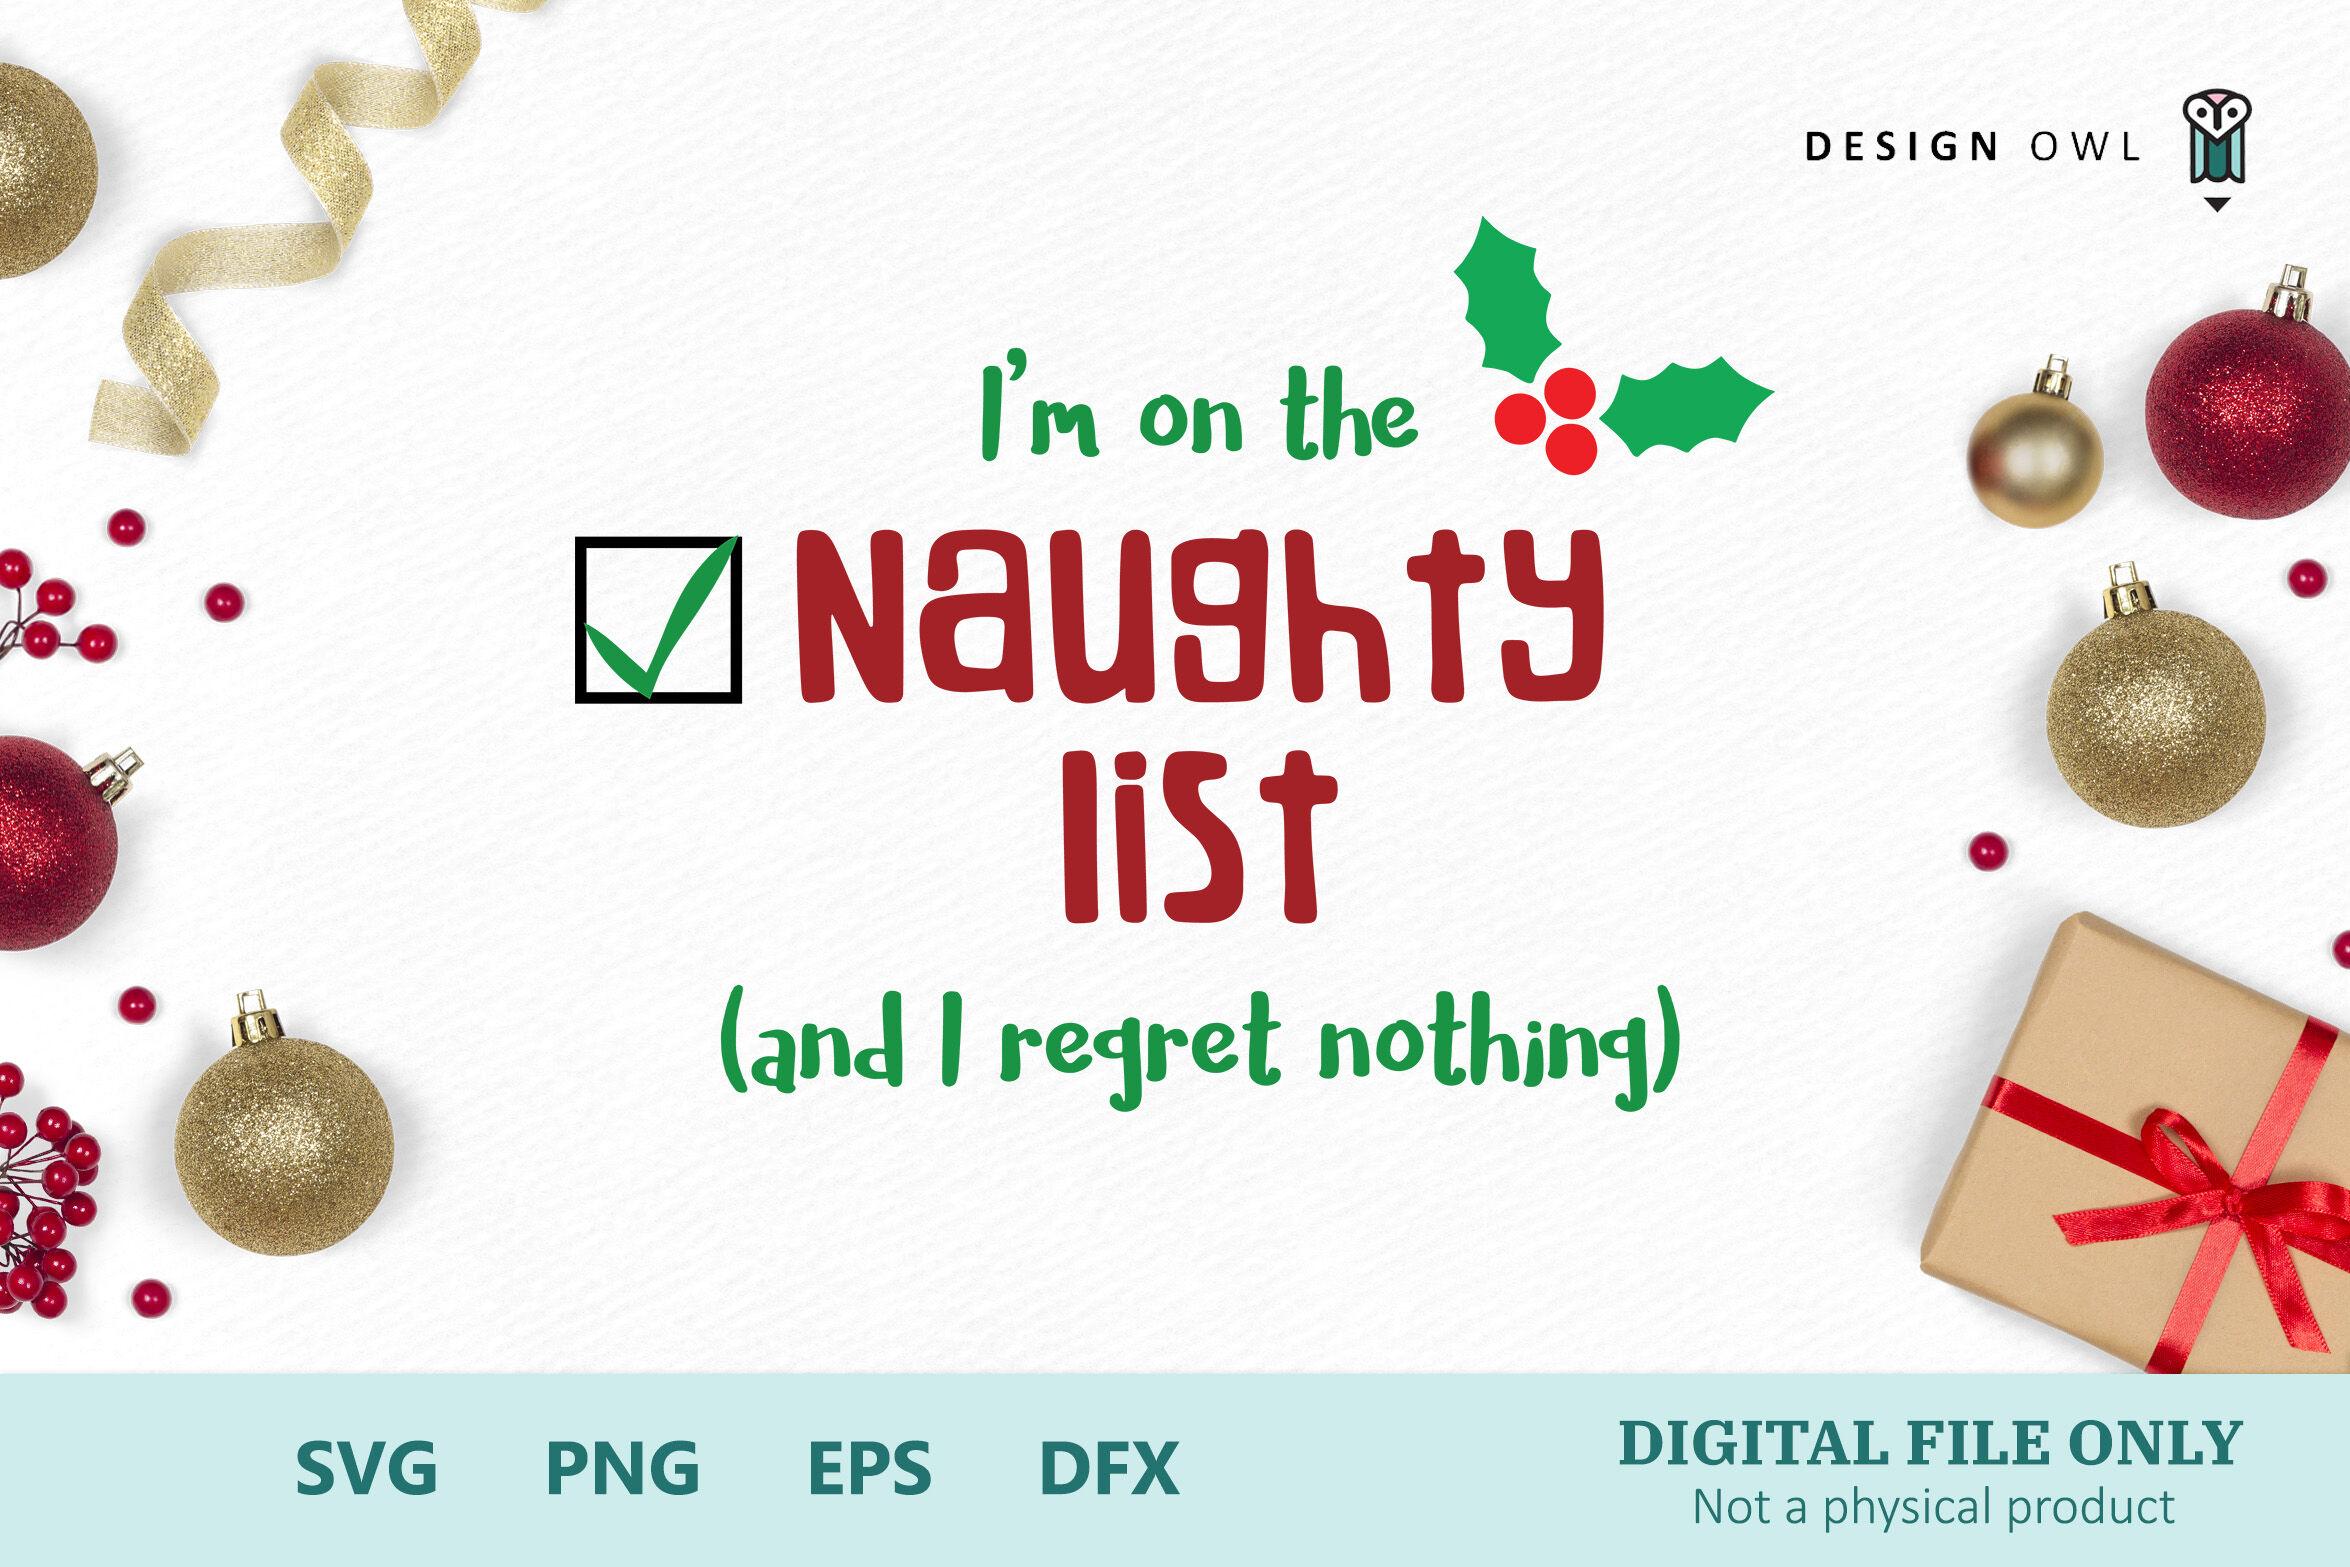 The Naughty List Bundle Svg Png Eps Dfx By Design Owl